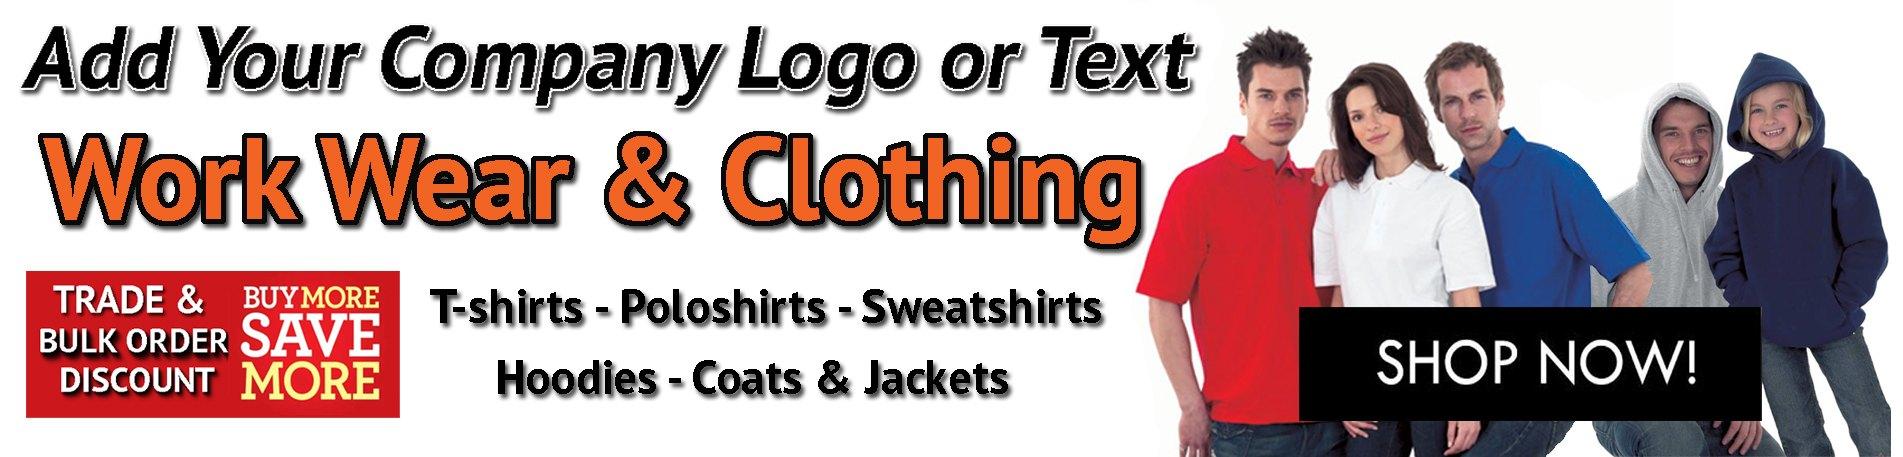 Custom Printed Clothing & Workwear